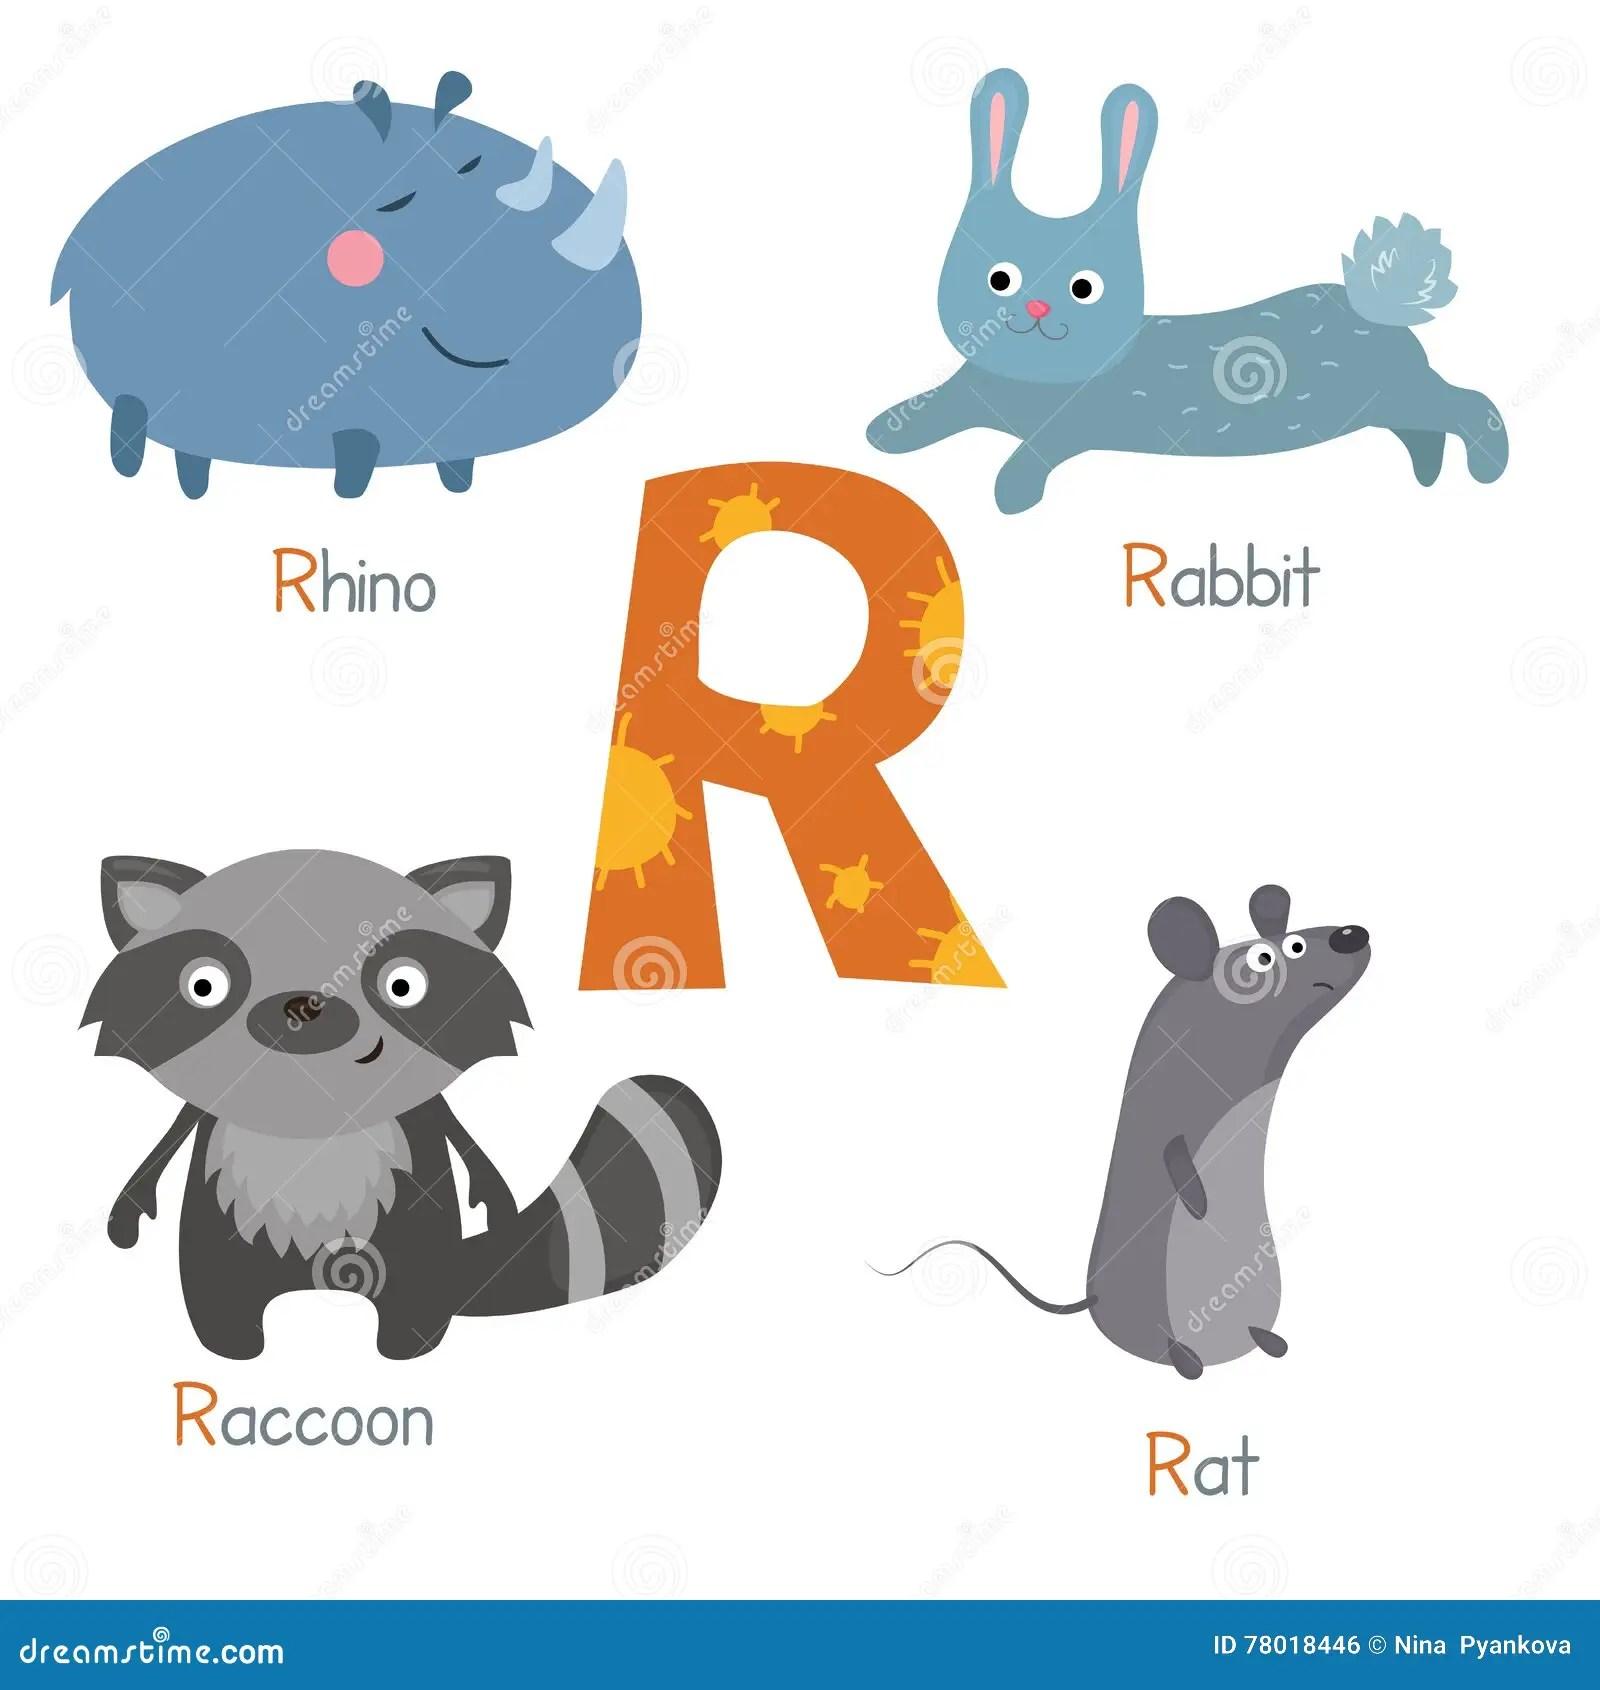 Rhino Student Vector Illustration